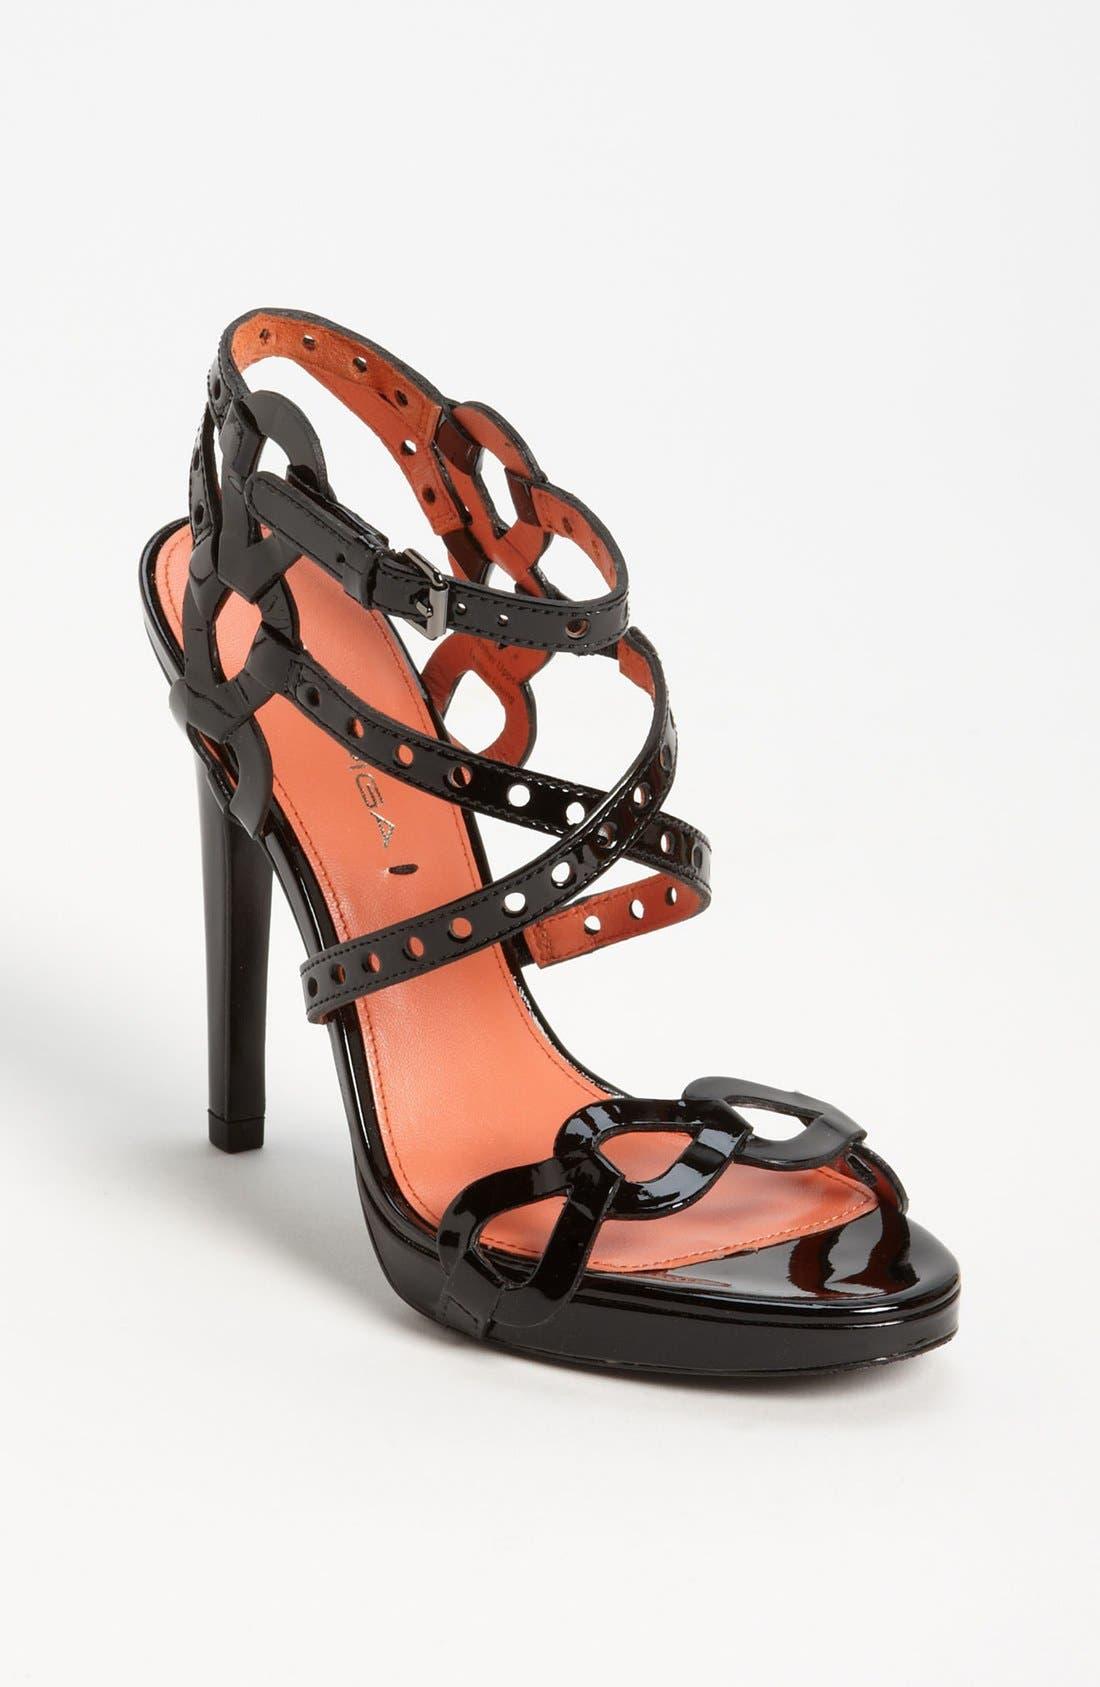 Alternate Image 1 Selected - Via Spiga 'Pacifica' Sandal